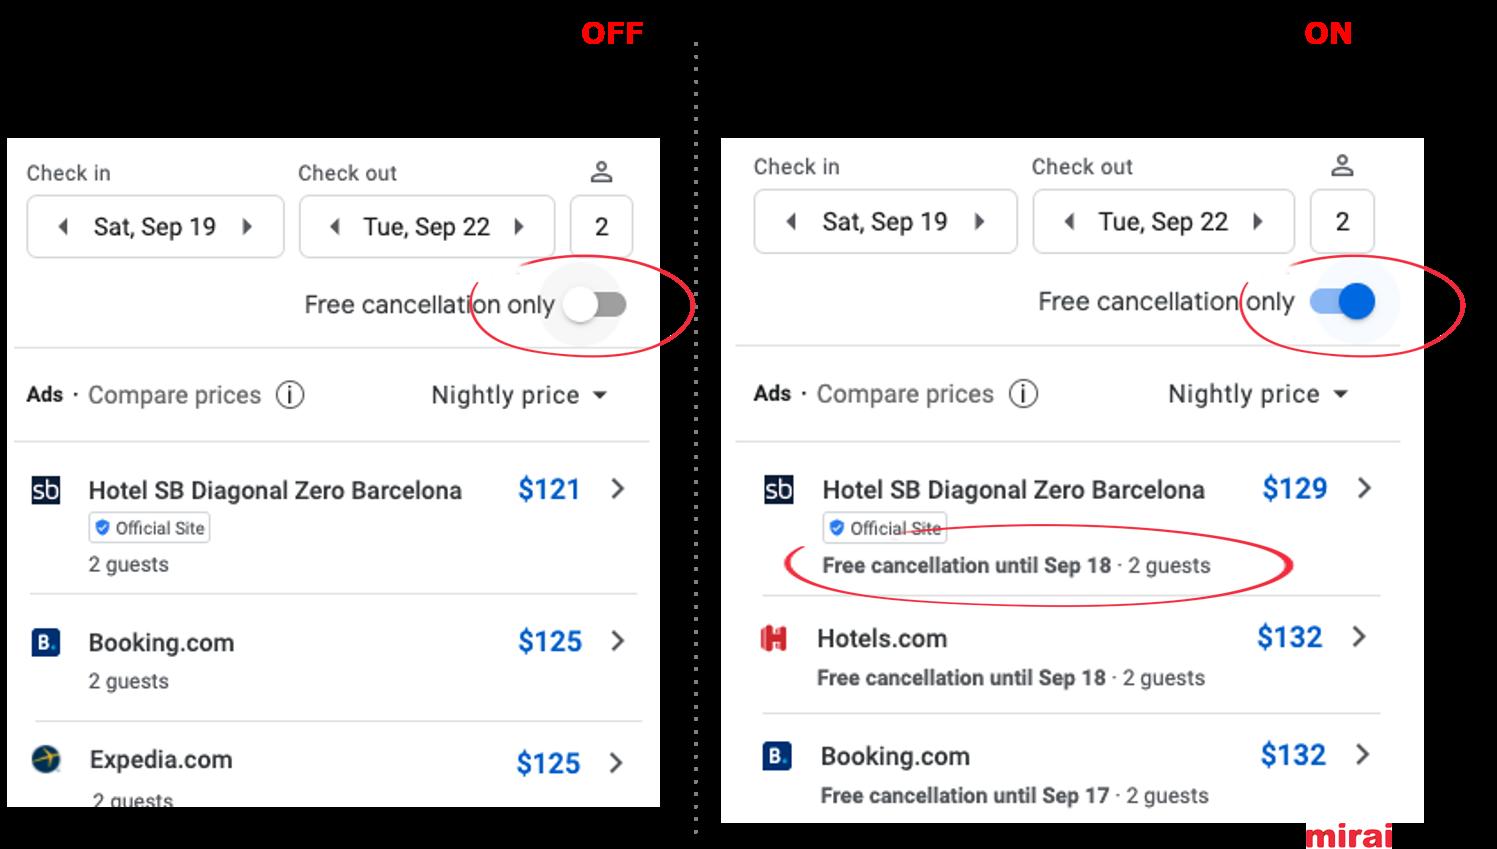 Free cancellation filter in Google Hotel Ads - Mirai